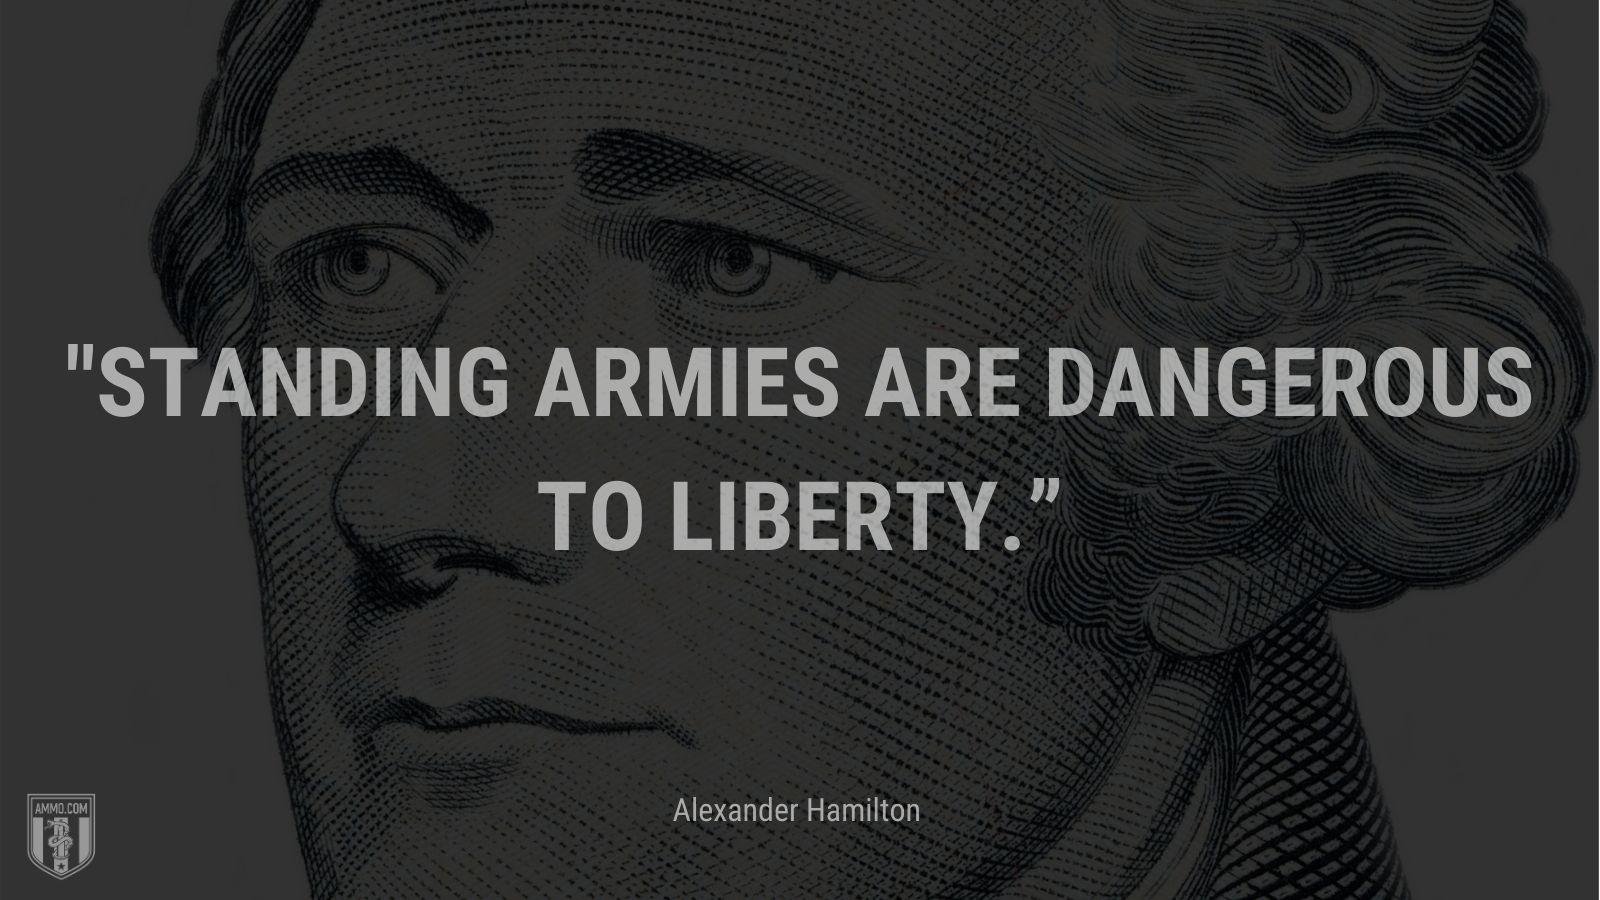 """Standing armies are dangerous to liberty."" - Alexander Hamilton"